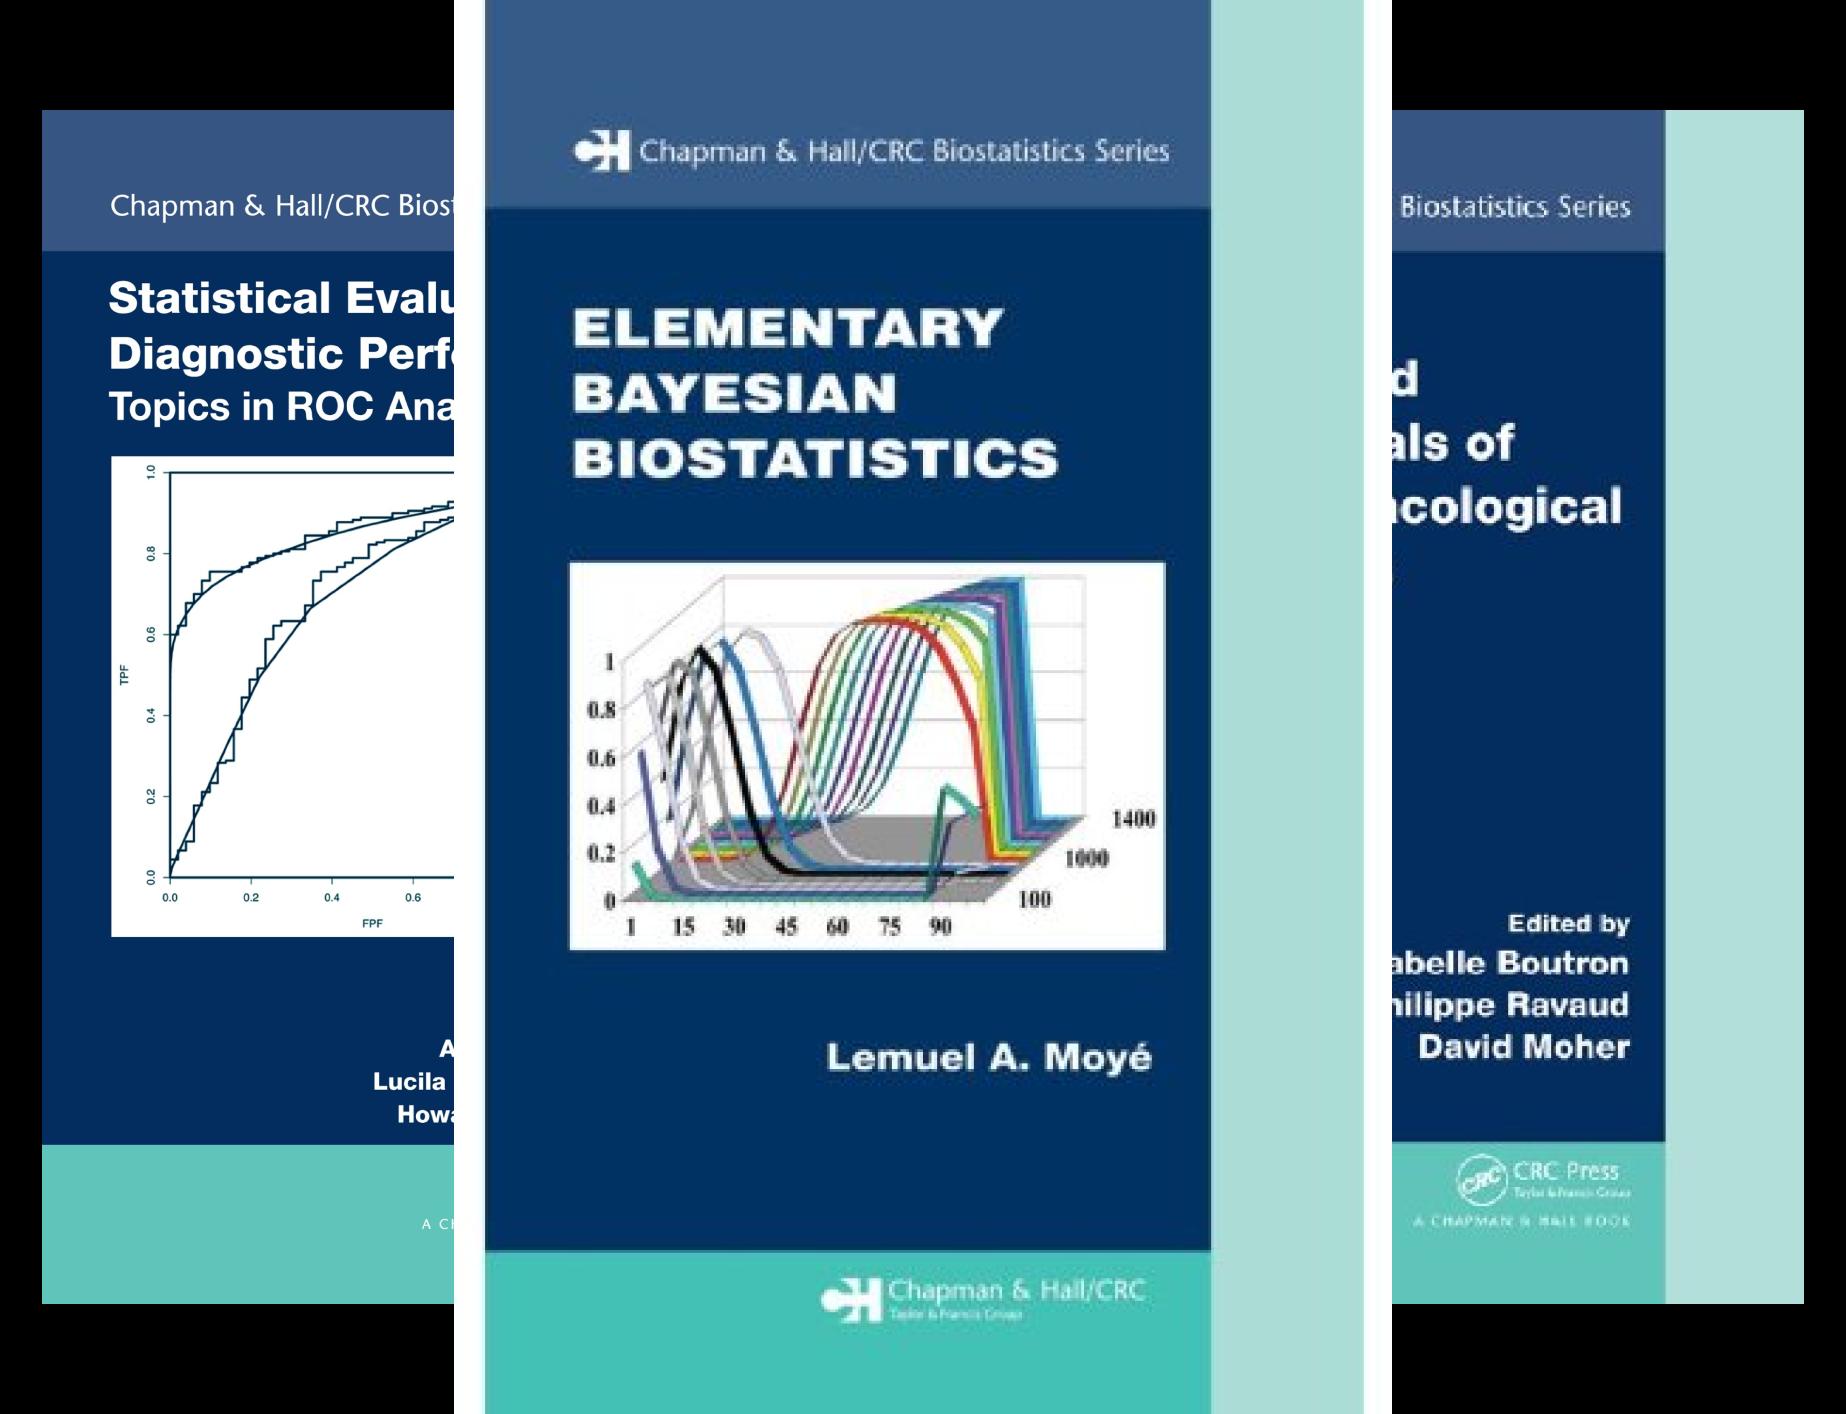 Chapman & Hall/CRC Biostatistics